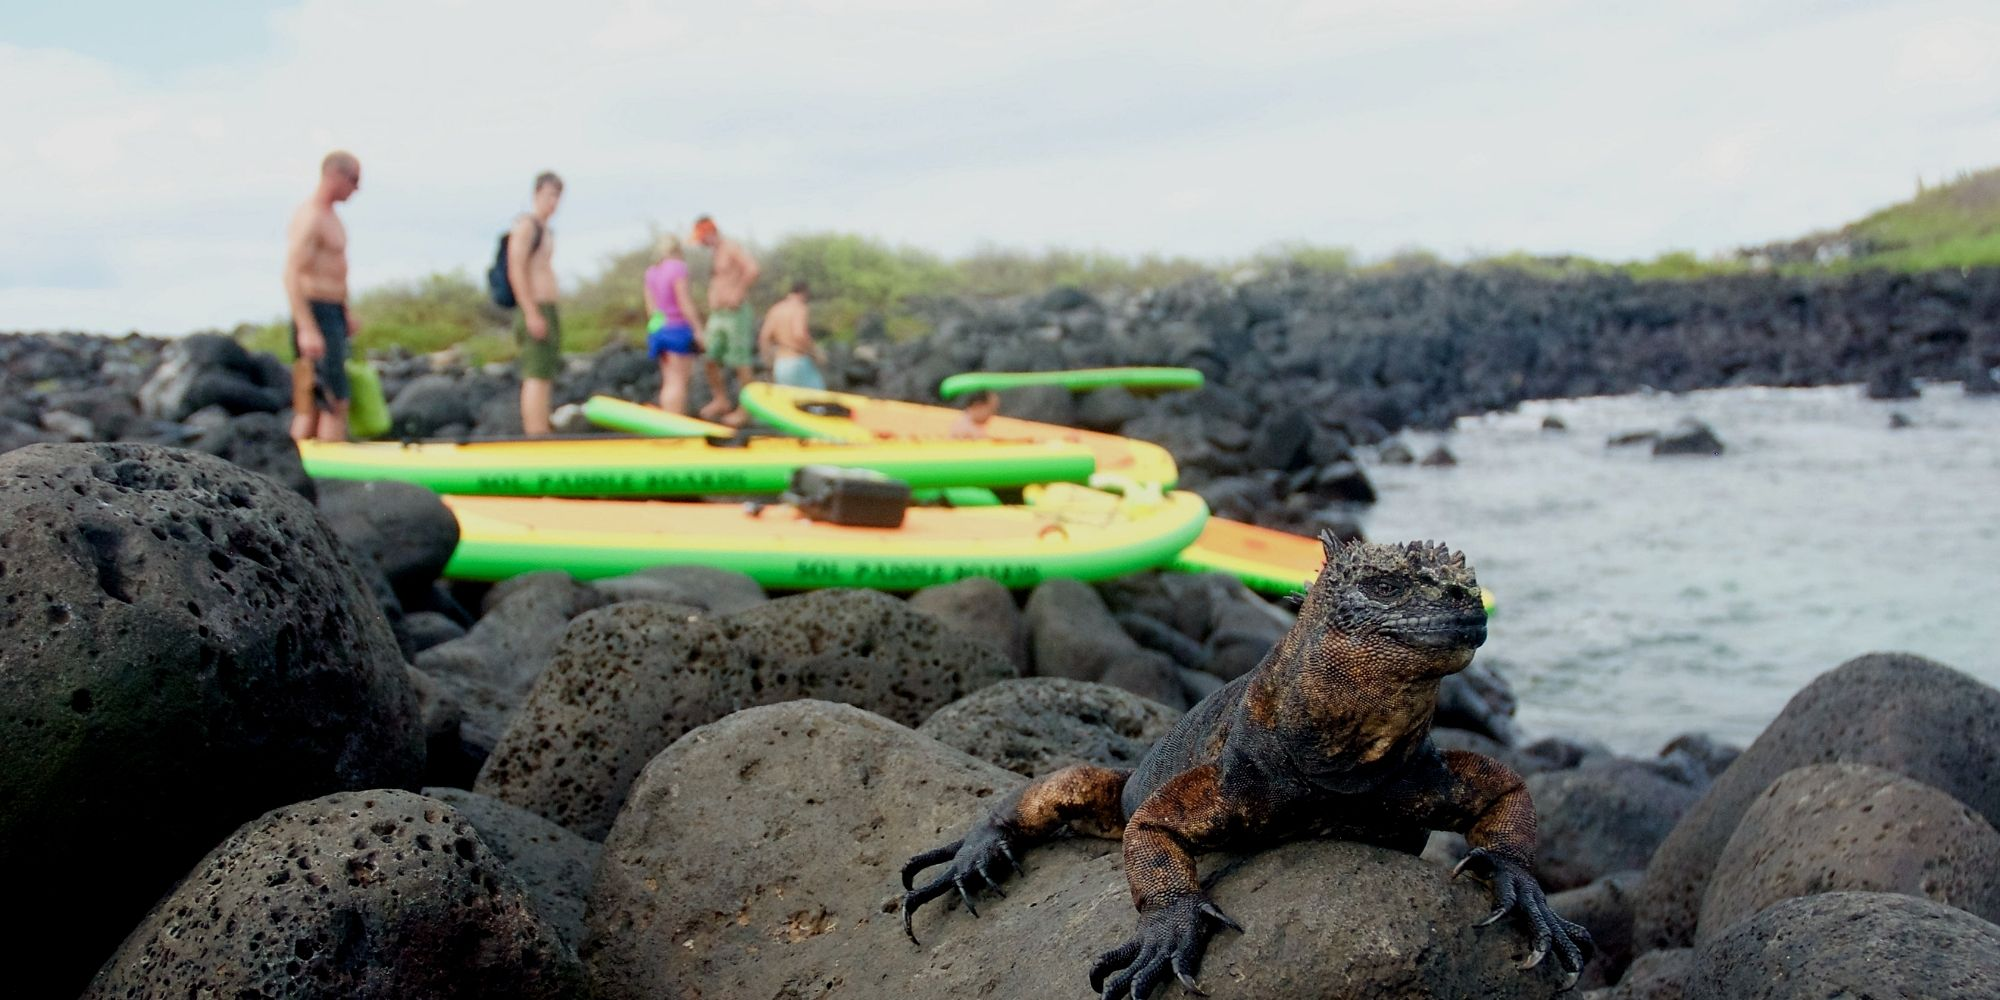 SUP Tour with Marine Iguana watching - Galapagos Islands